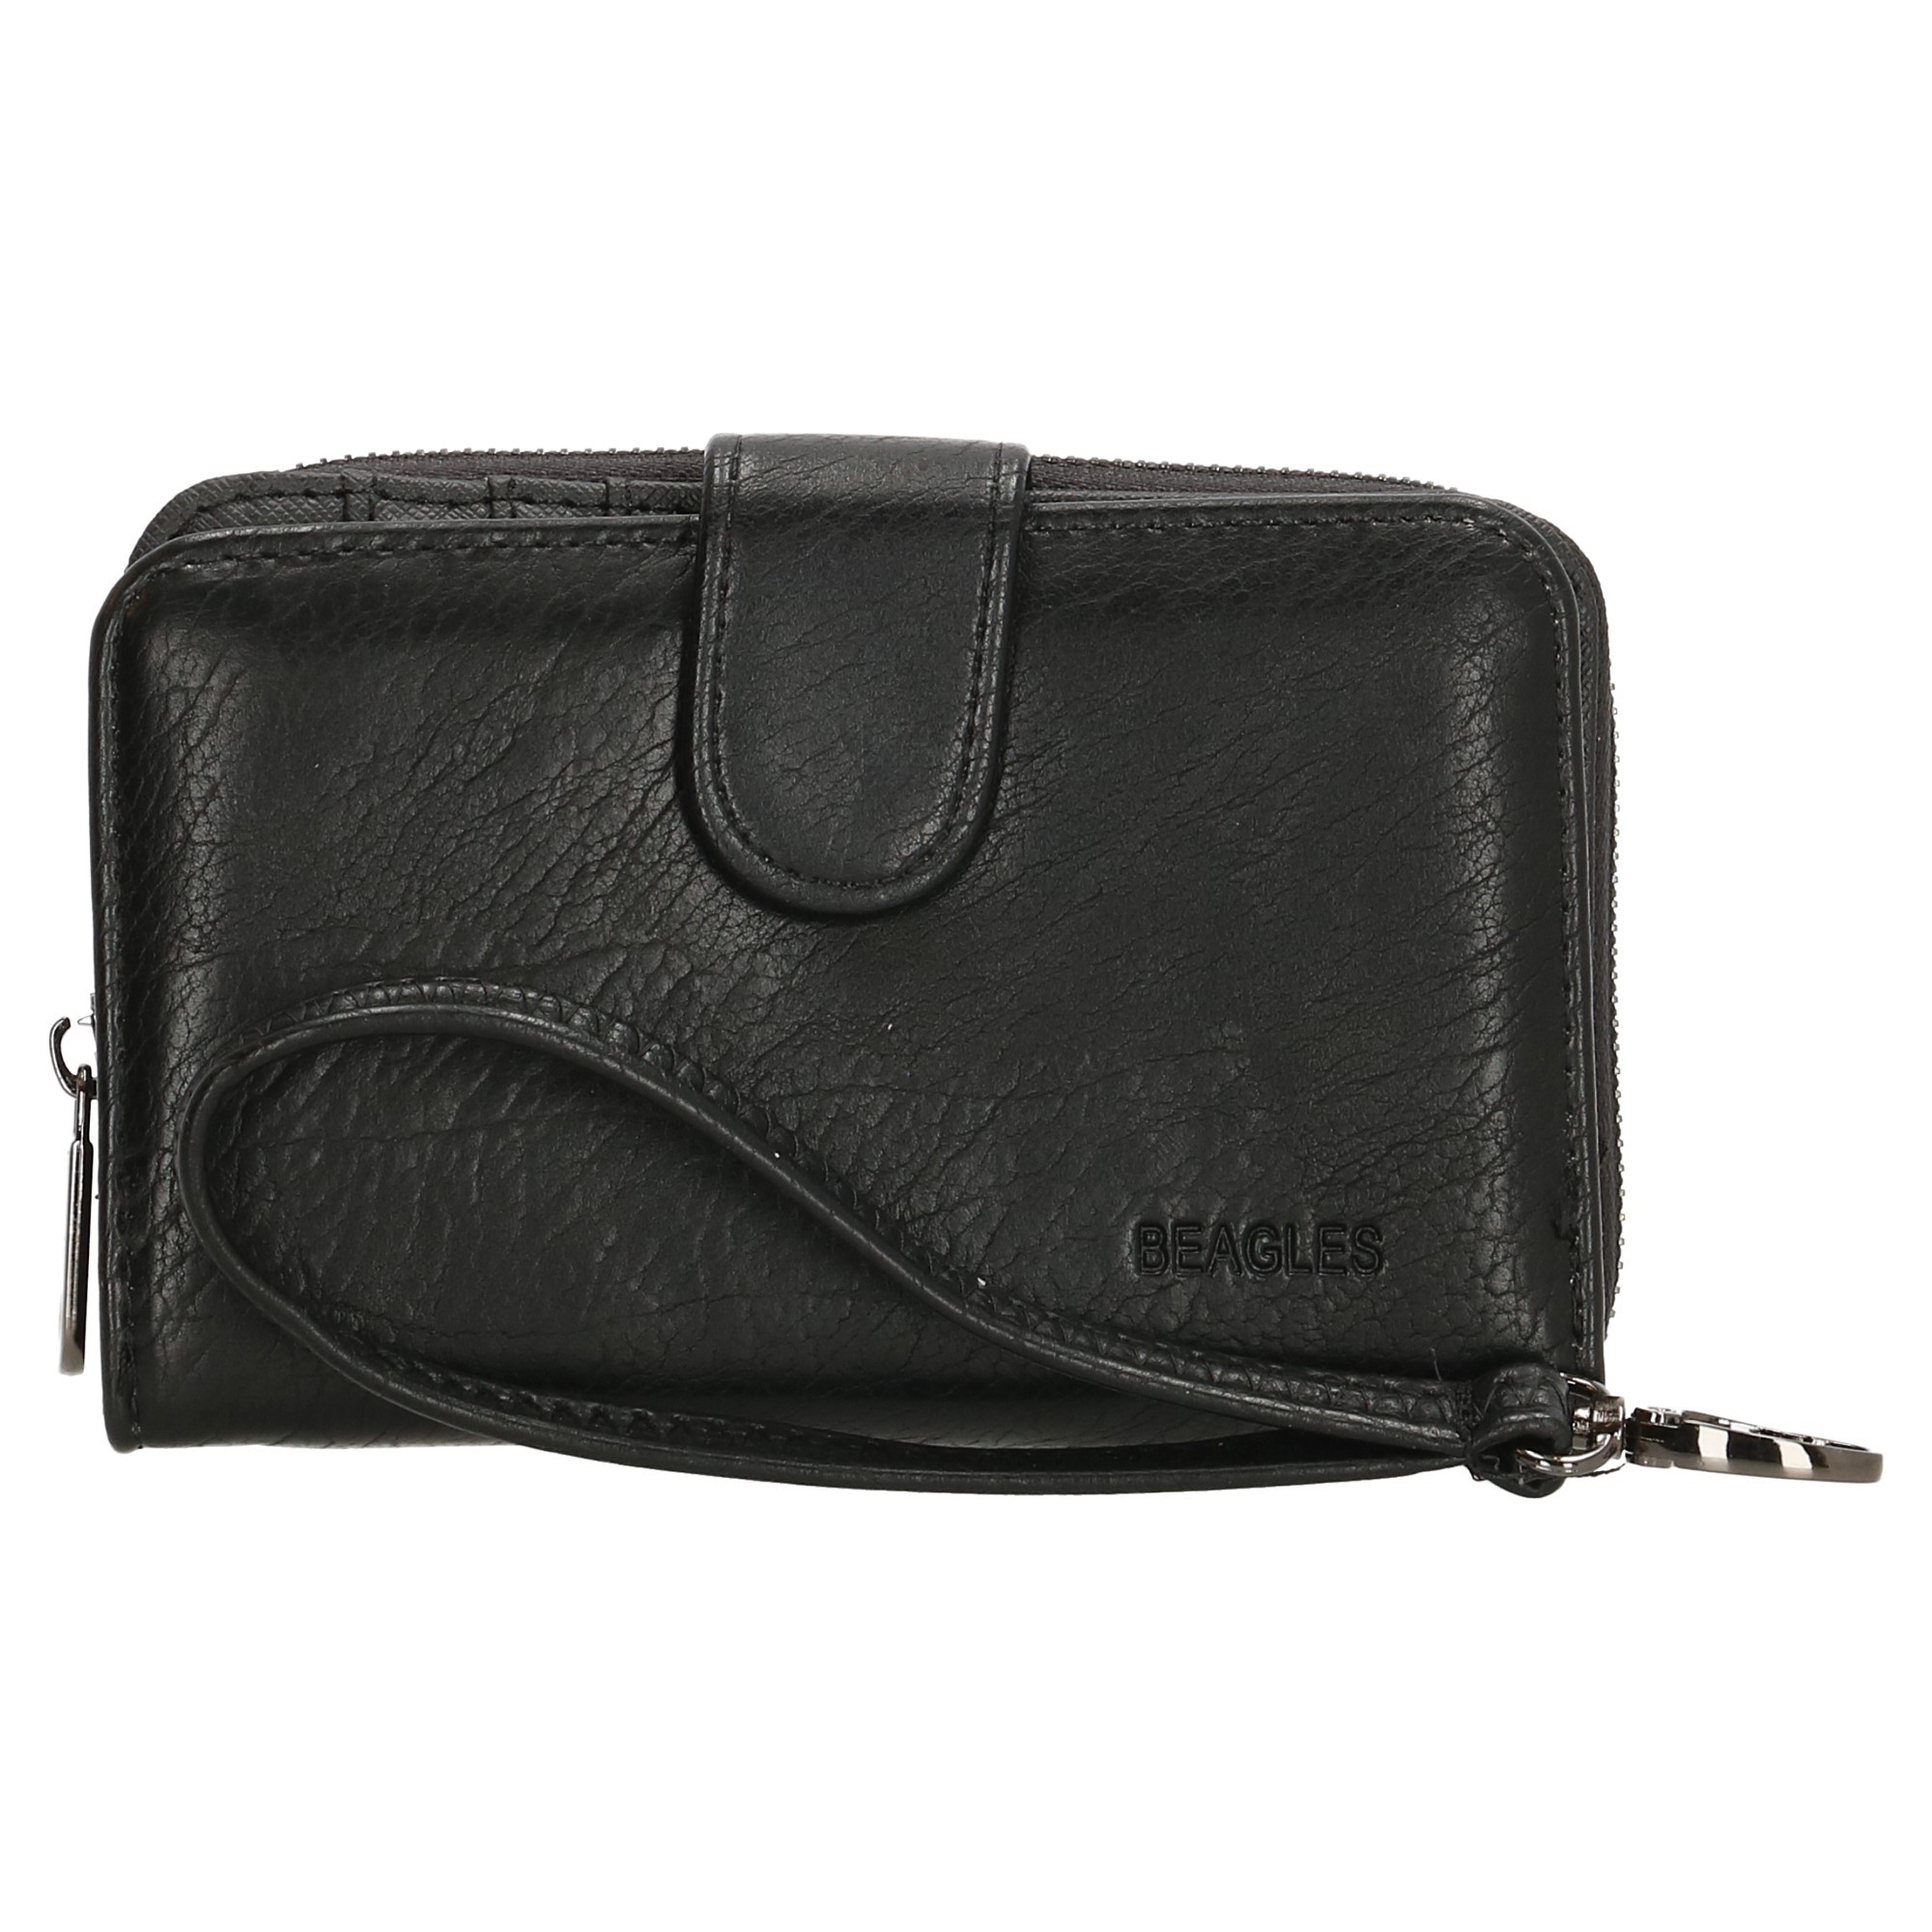 Beagles Lliria Dames Portemonnee 16726 Zwart